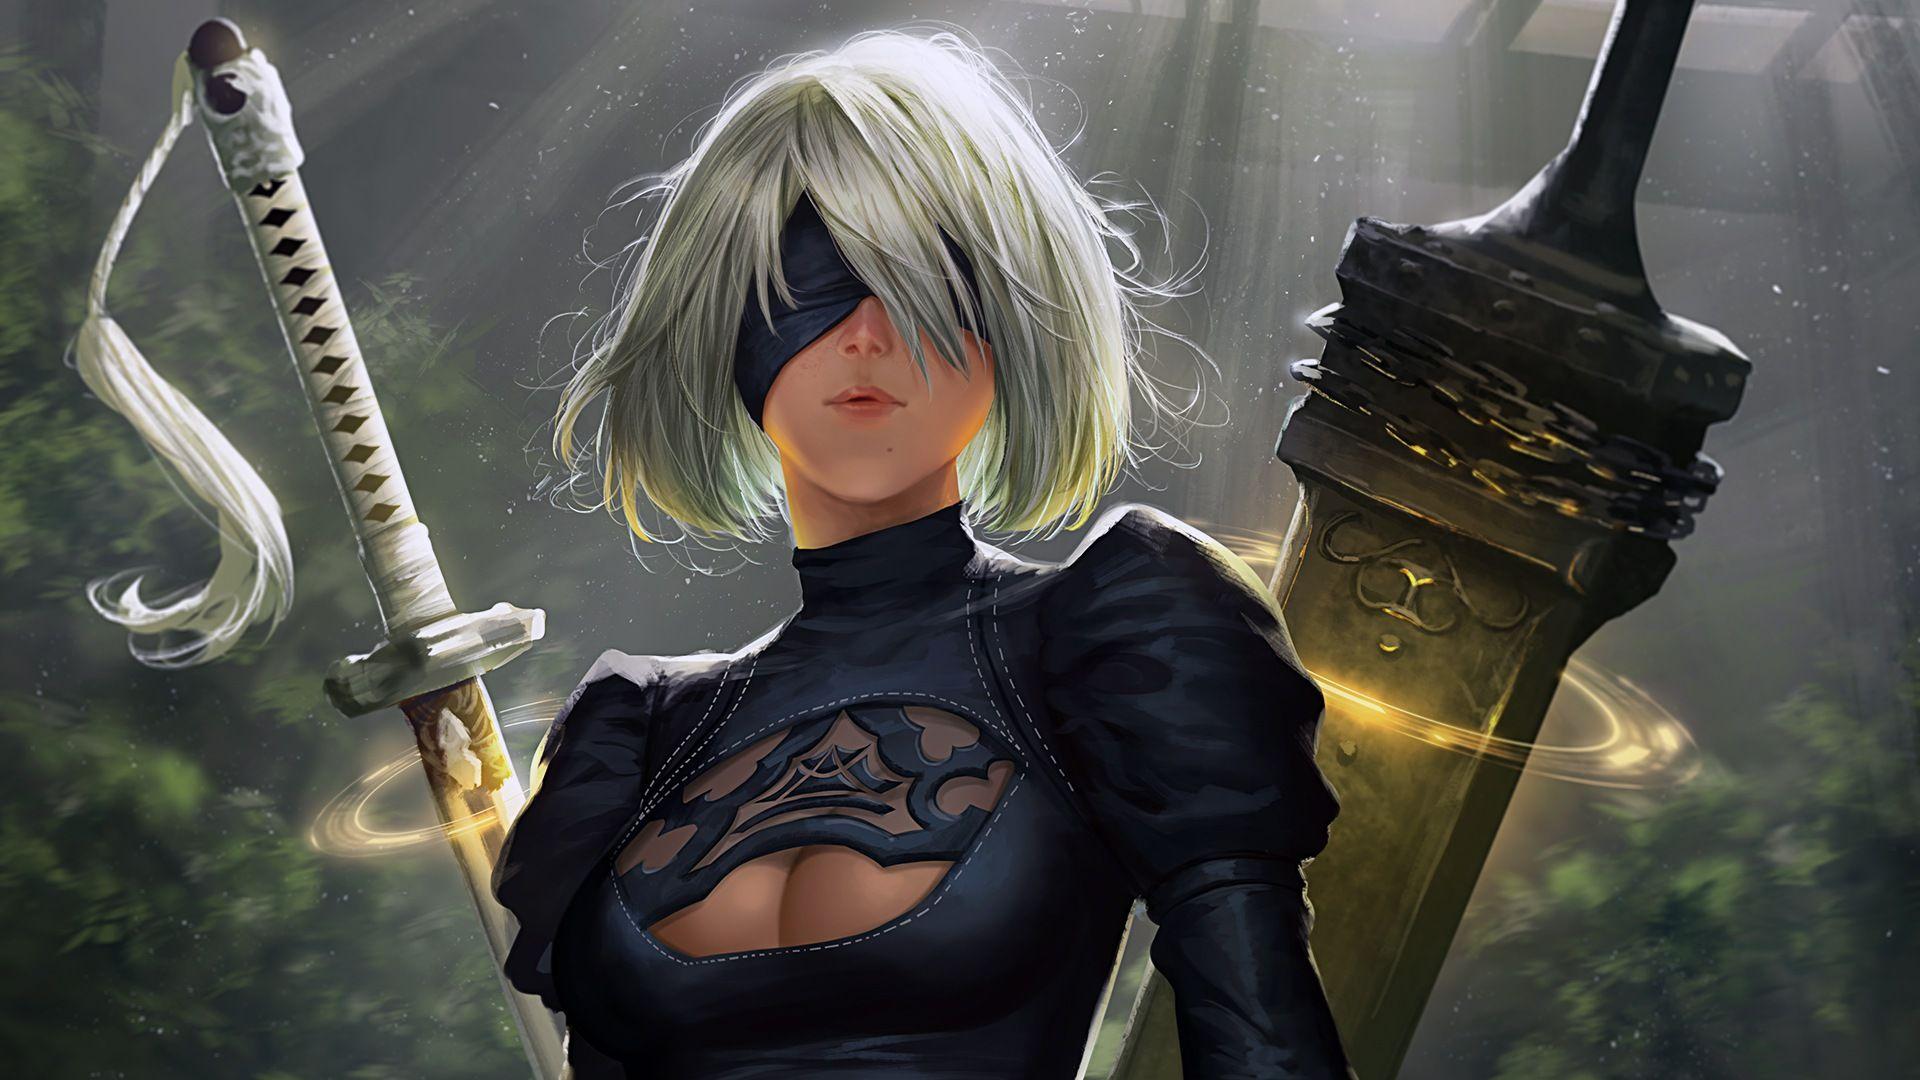 2b Nier Automata Katana Hd 4k Wallpaper: 2B Katana And Sword Nier Automata Girl #32975